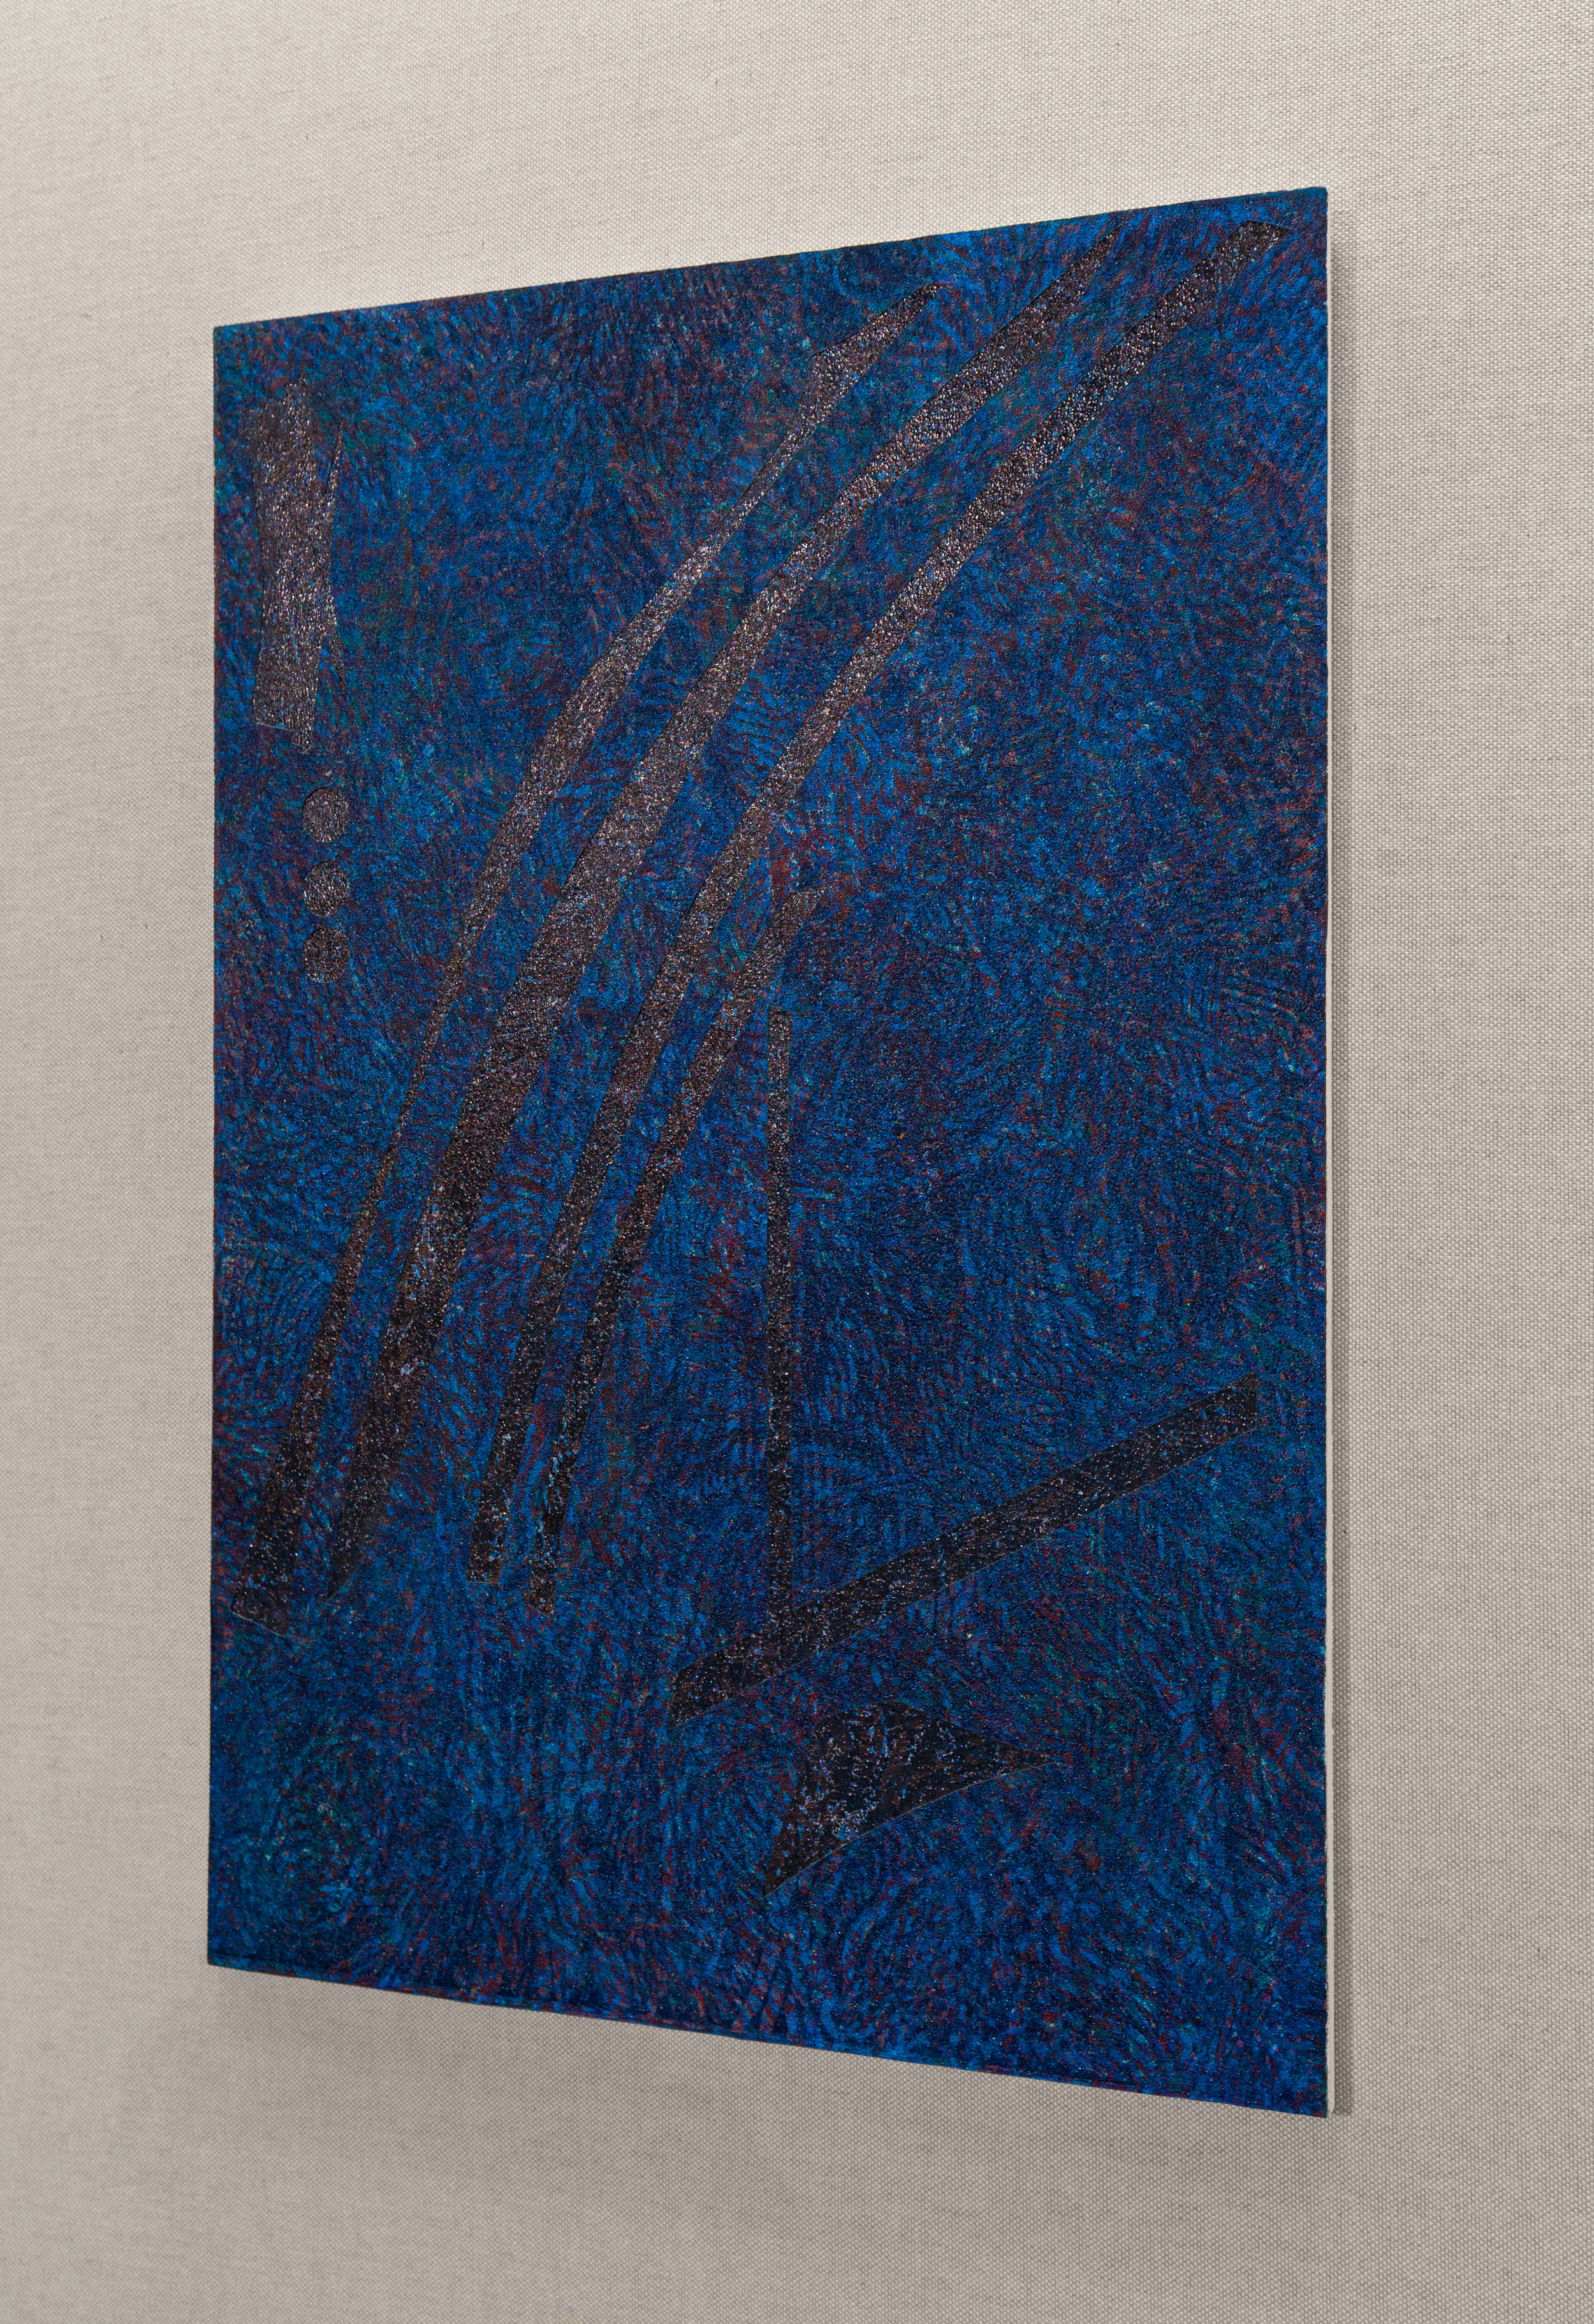 Field of Irisarri (Variation 1), Woodblock print & MDF board, Shoreline Community College, 2017